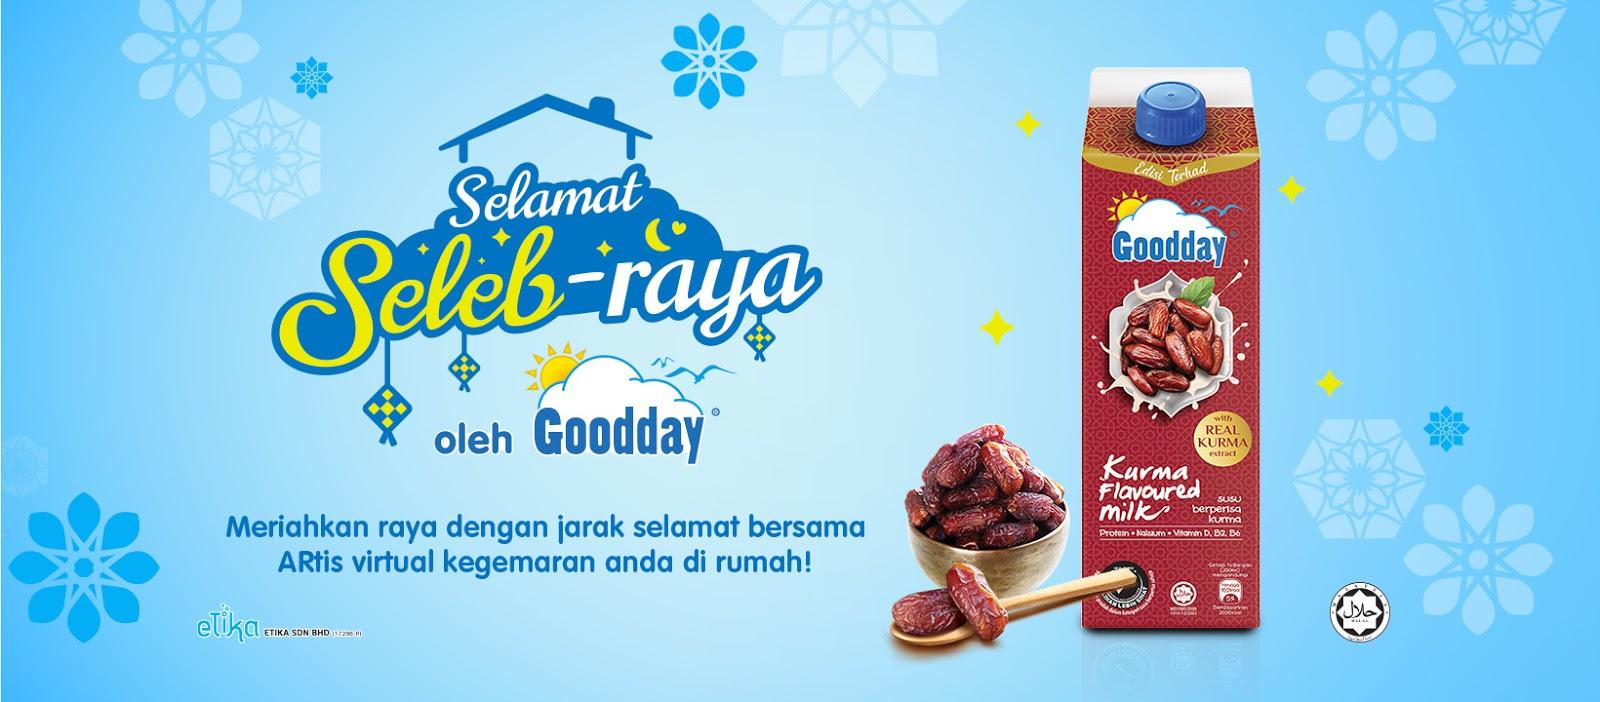 Goodday Milk Malaysia Selamat Seleb-raya - WebAR